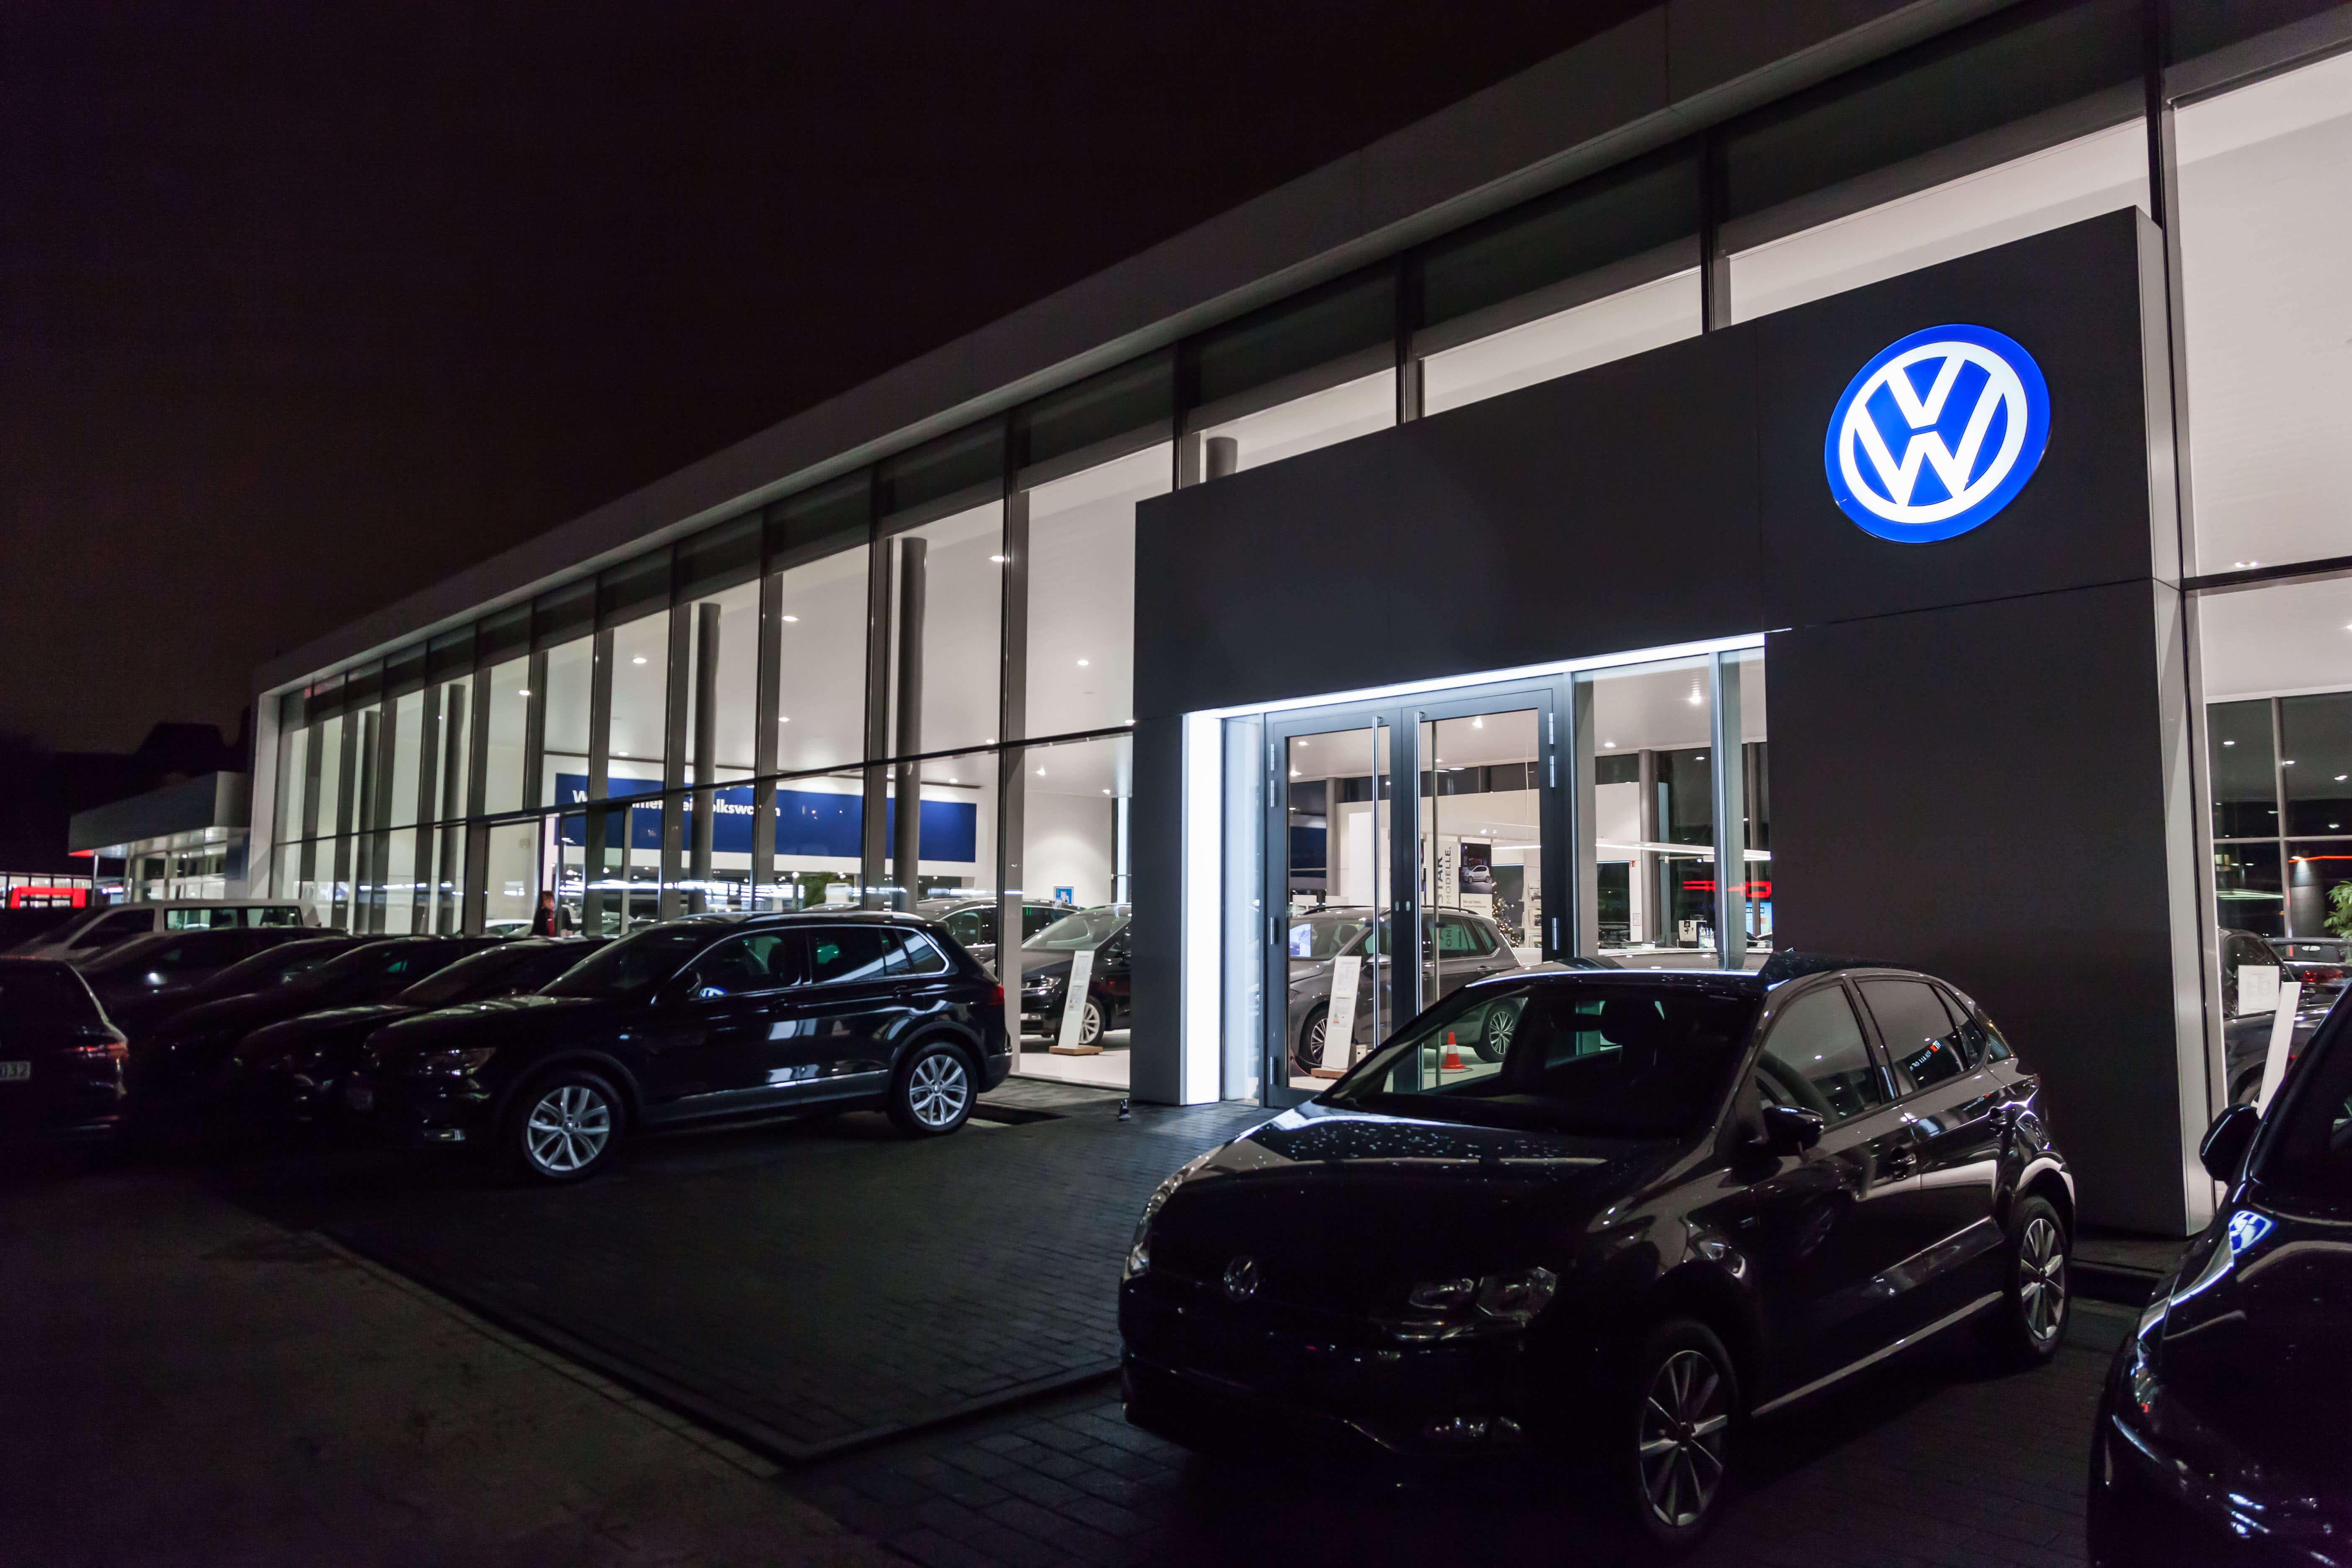 VW Aachen